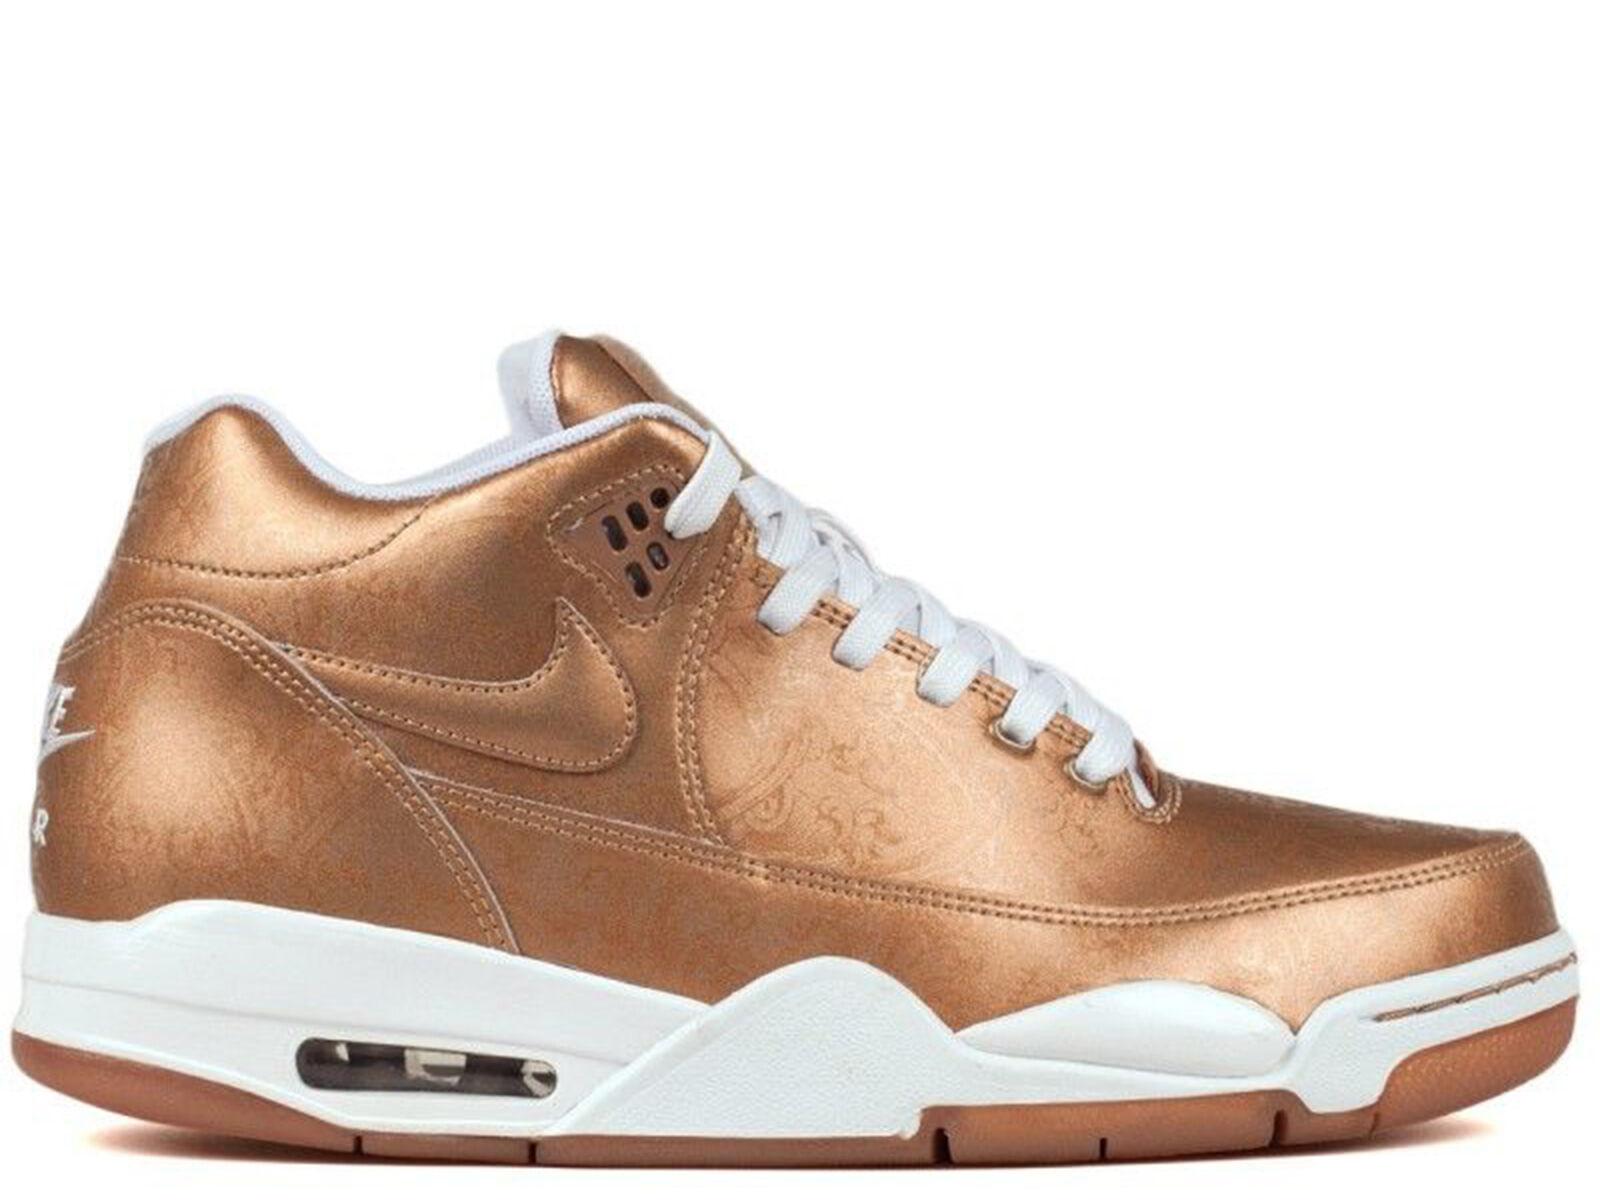 Brand New Nike Flight Squad Men's Athletic Fashion Sneakers [724986 900]